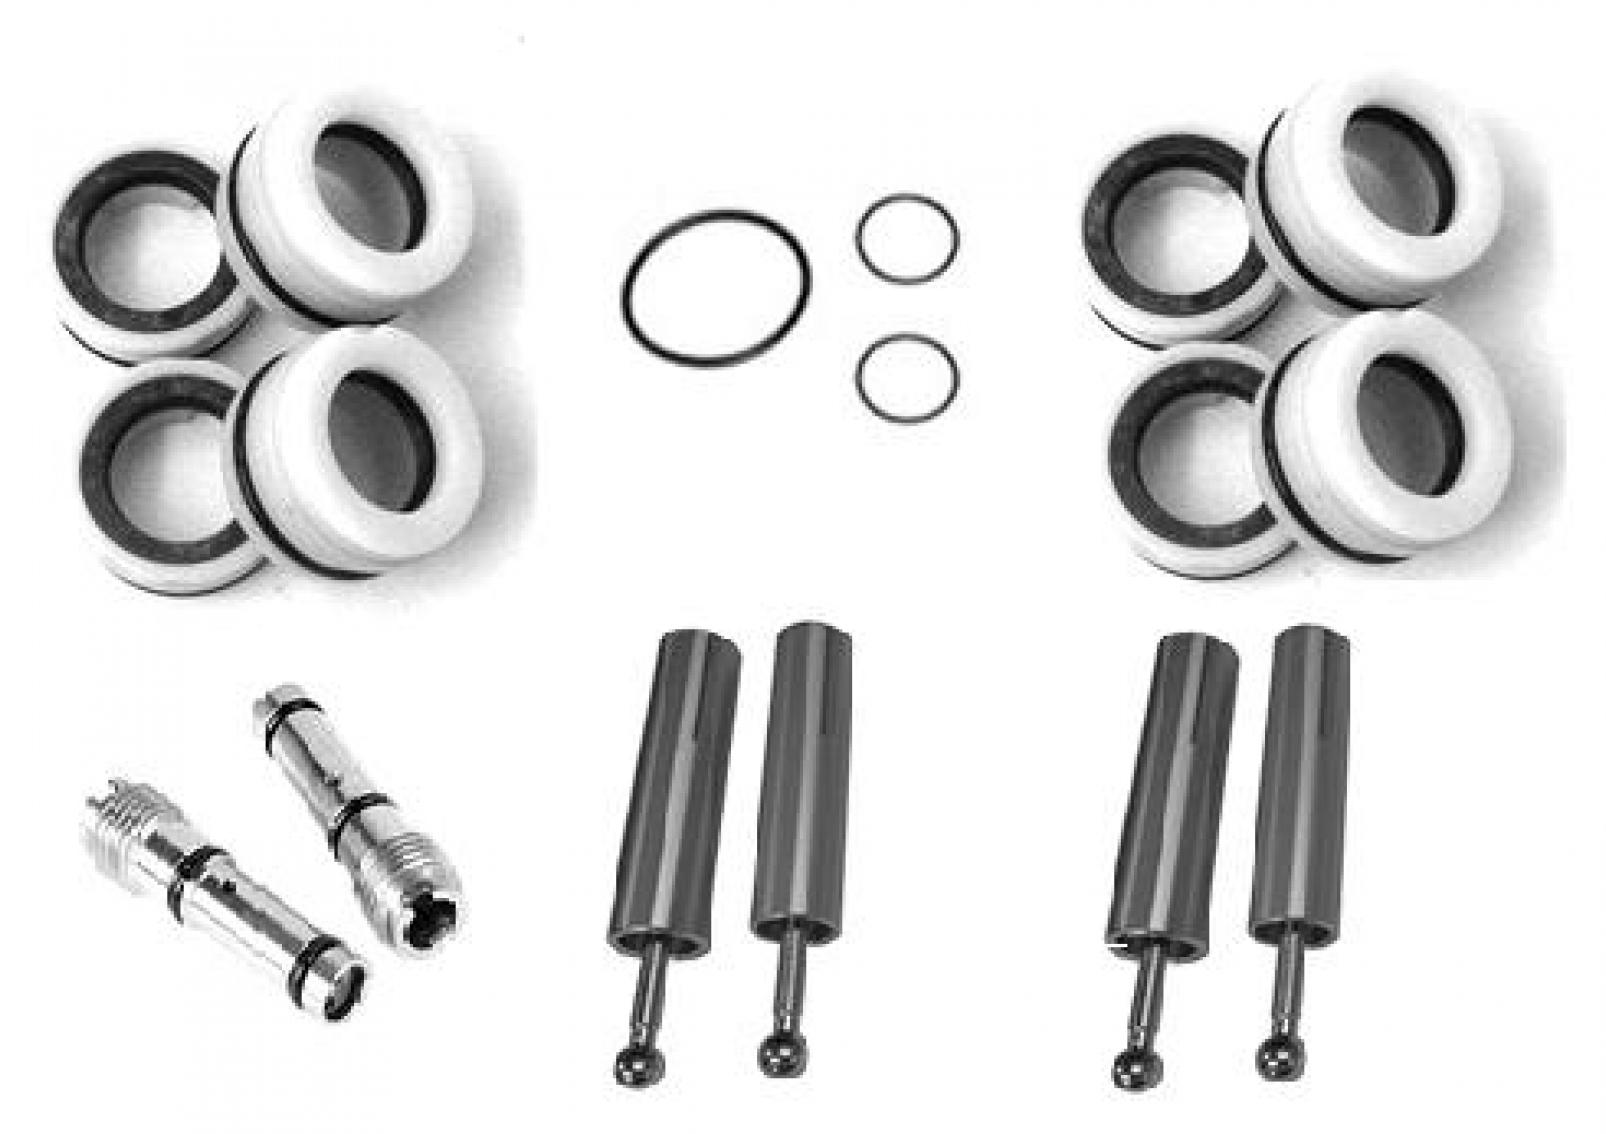 Gear Actuator Lever Repair Kit, 628072AM (with Pentosin)